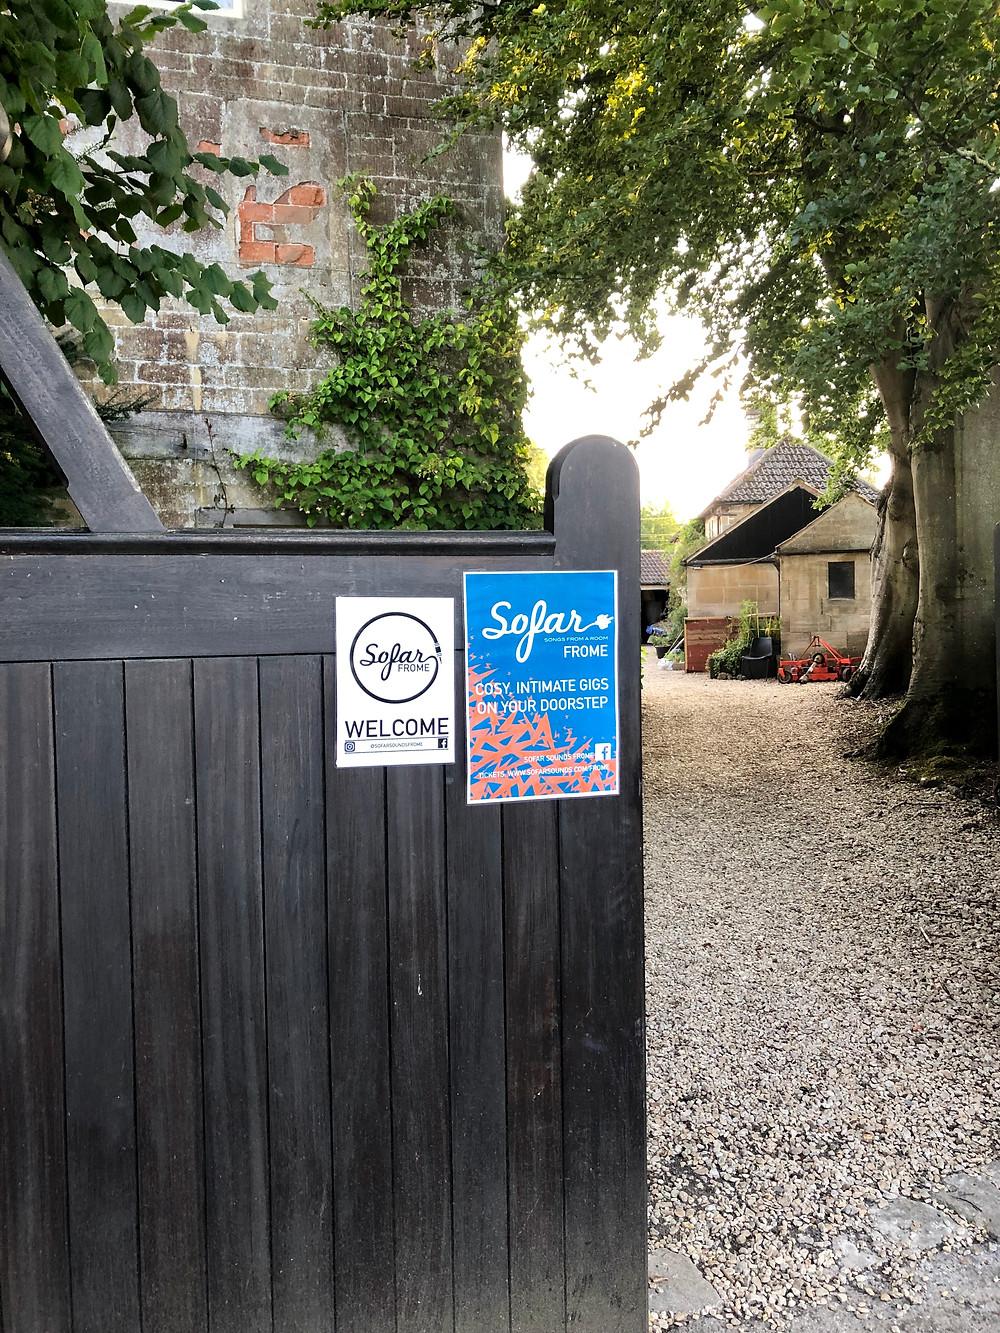 Somerset cool, Sofar sounds frome, Somerset blogger, Somerset blog